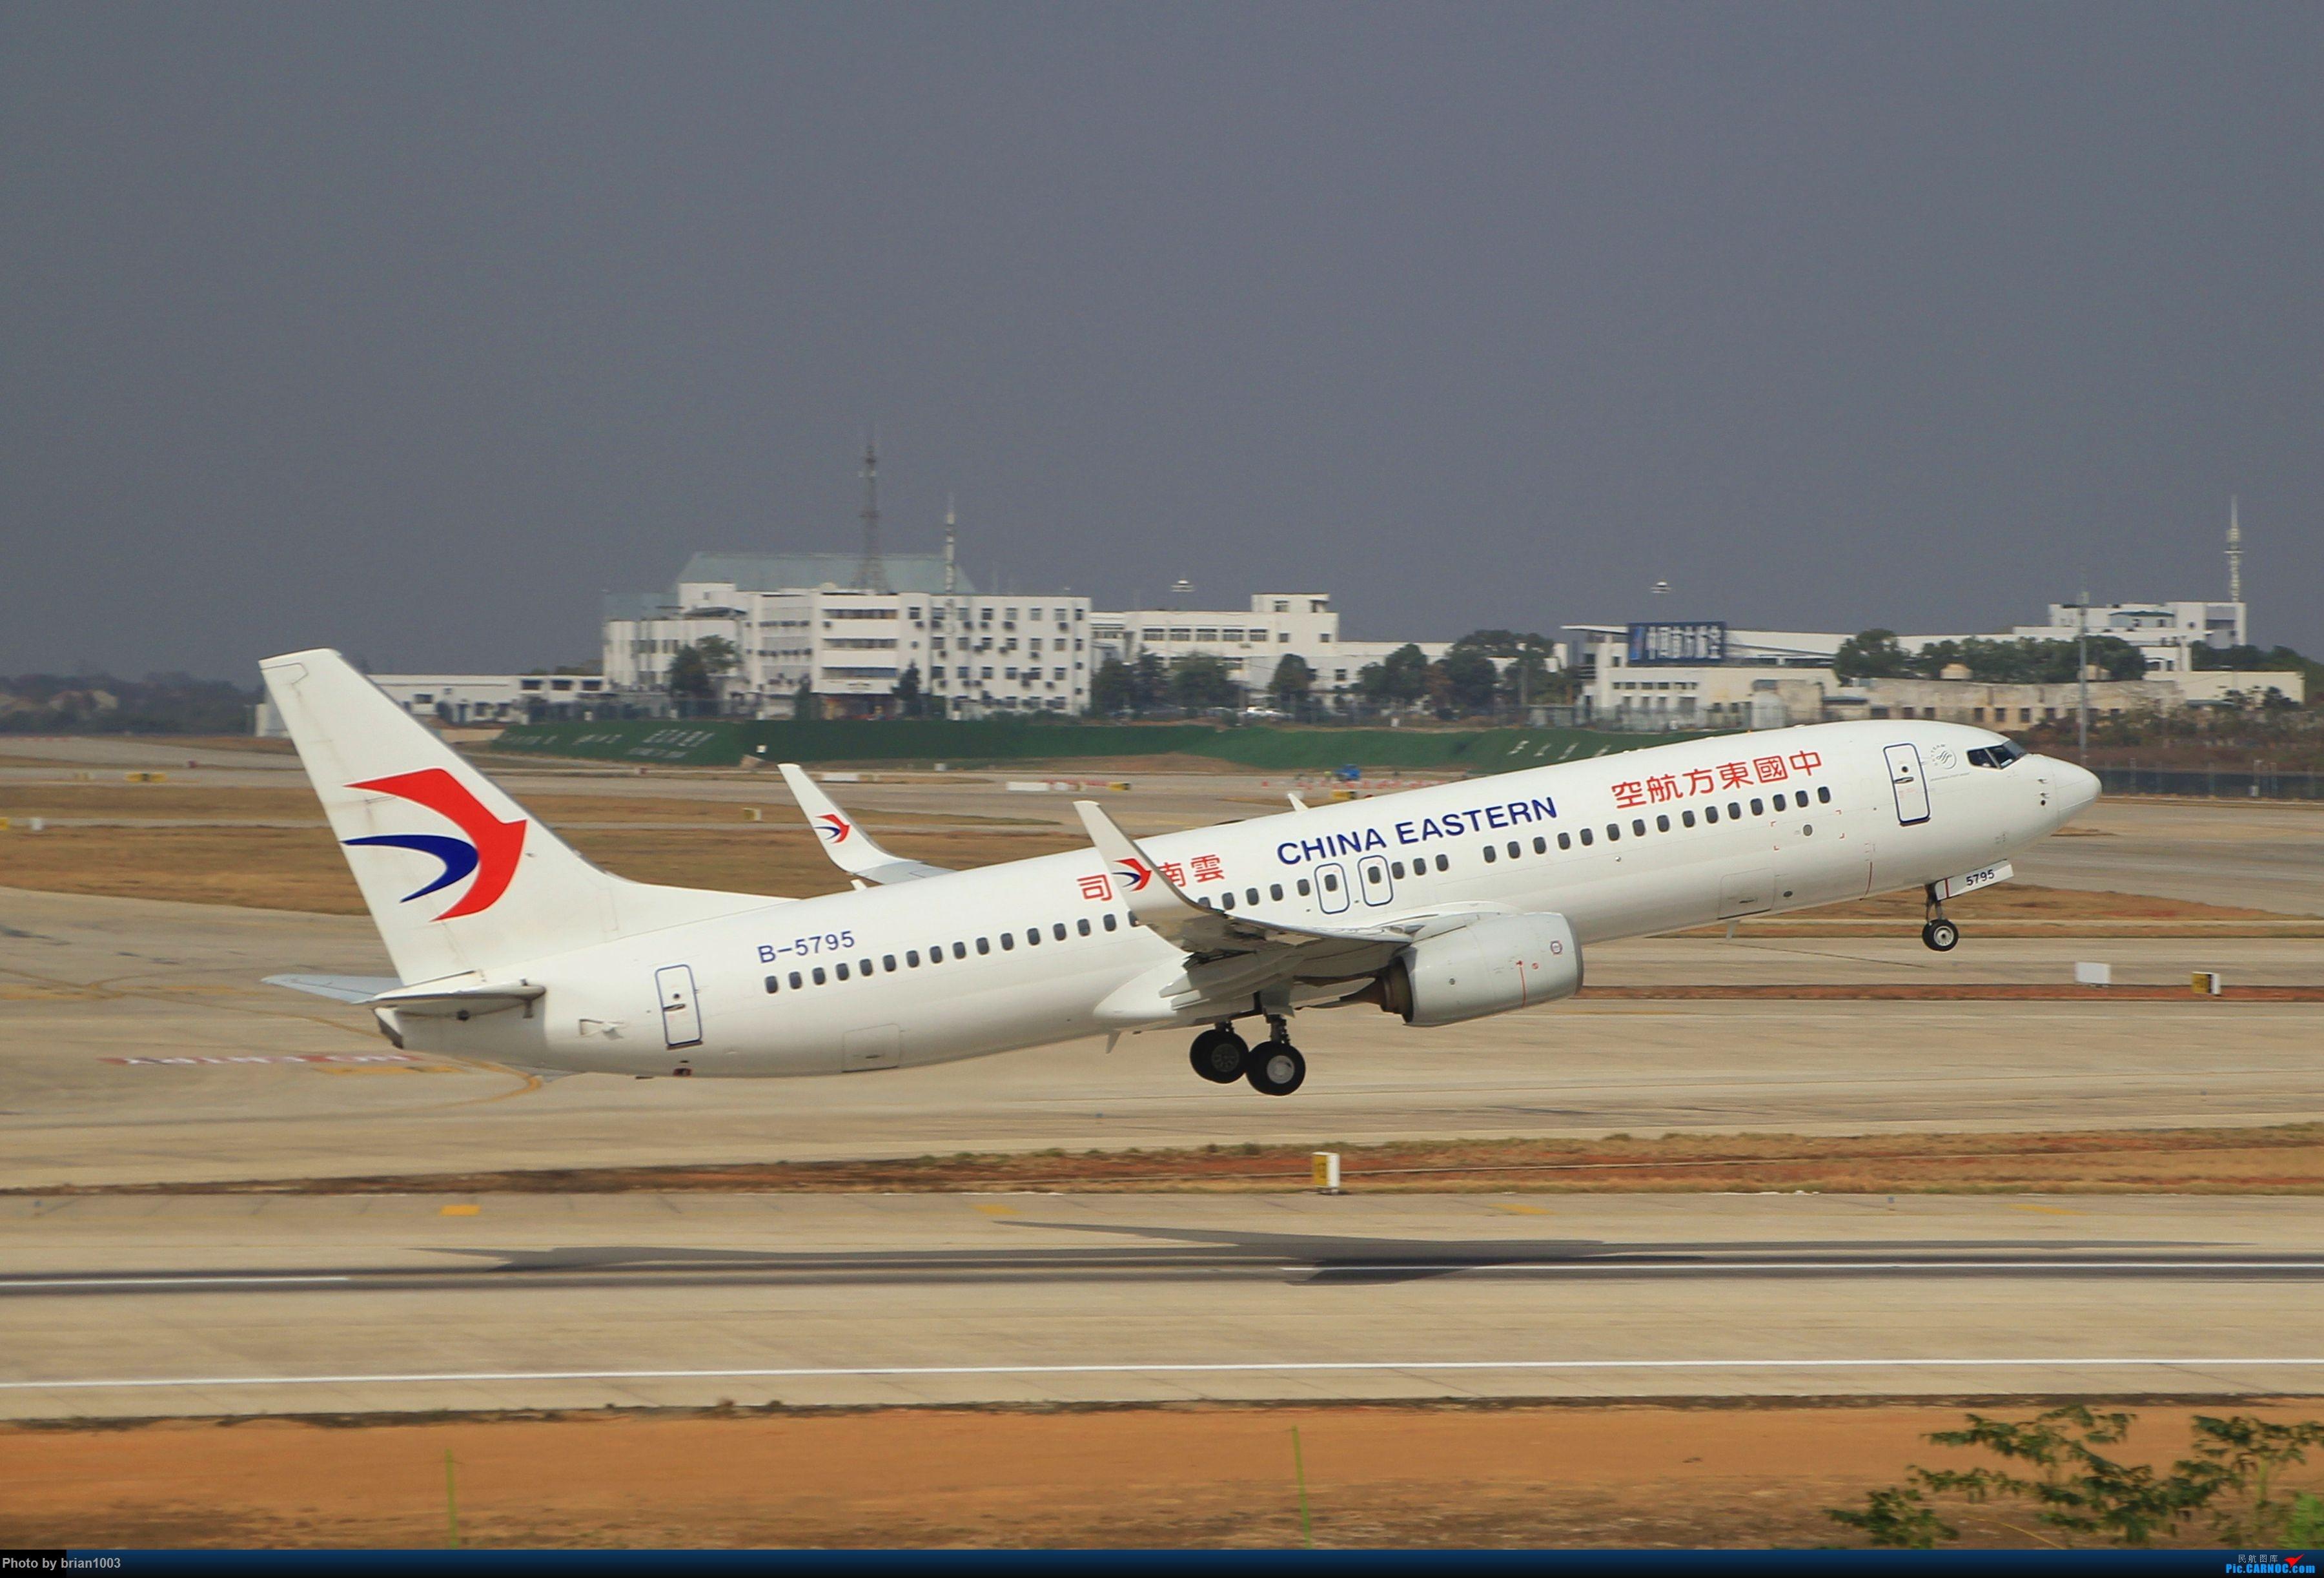 Re:[原创]WUH武汉天河机场拍机之新航季来的海航333和幸福的738 BOEING 737-800 B-5795 中国武汉天河国际机场